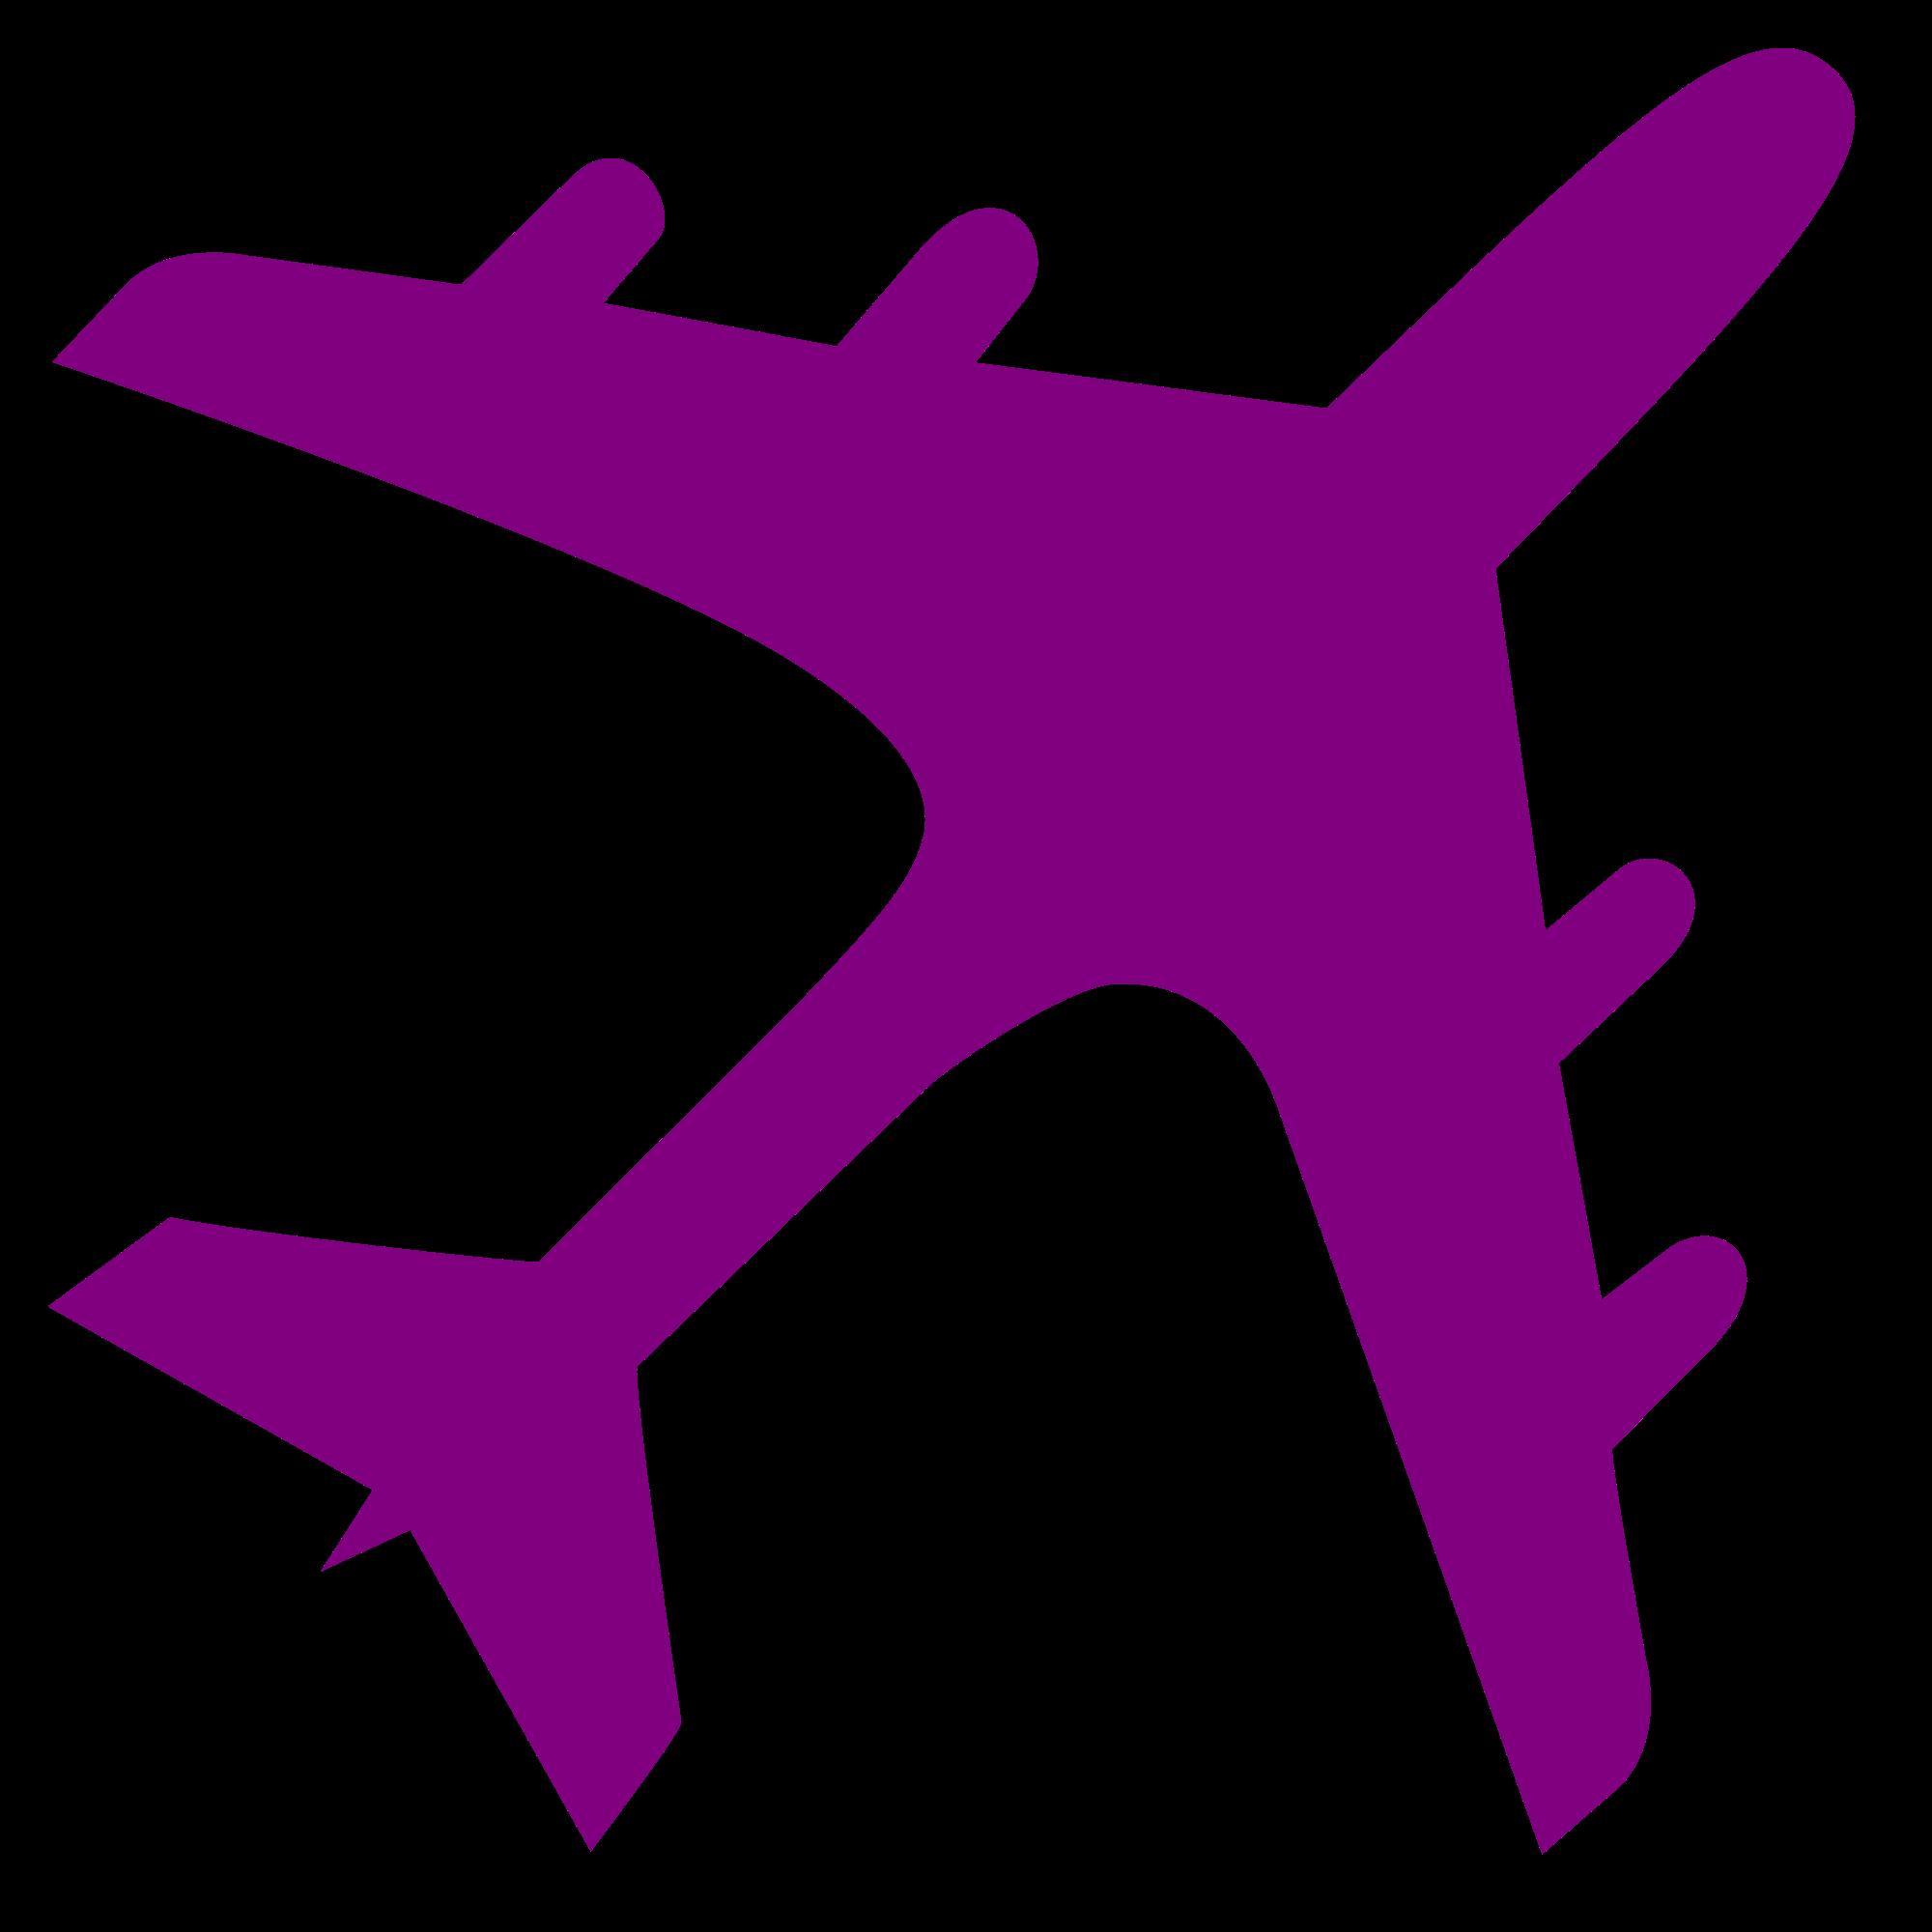 2000x2000 Fileairplane Silhouette Purple.svg